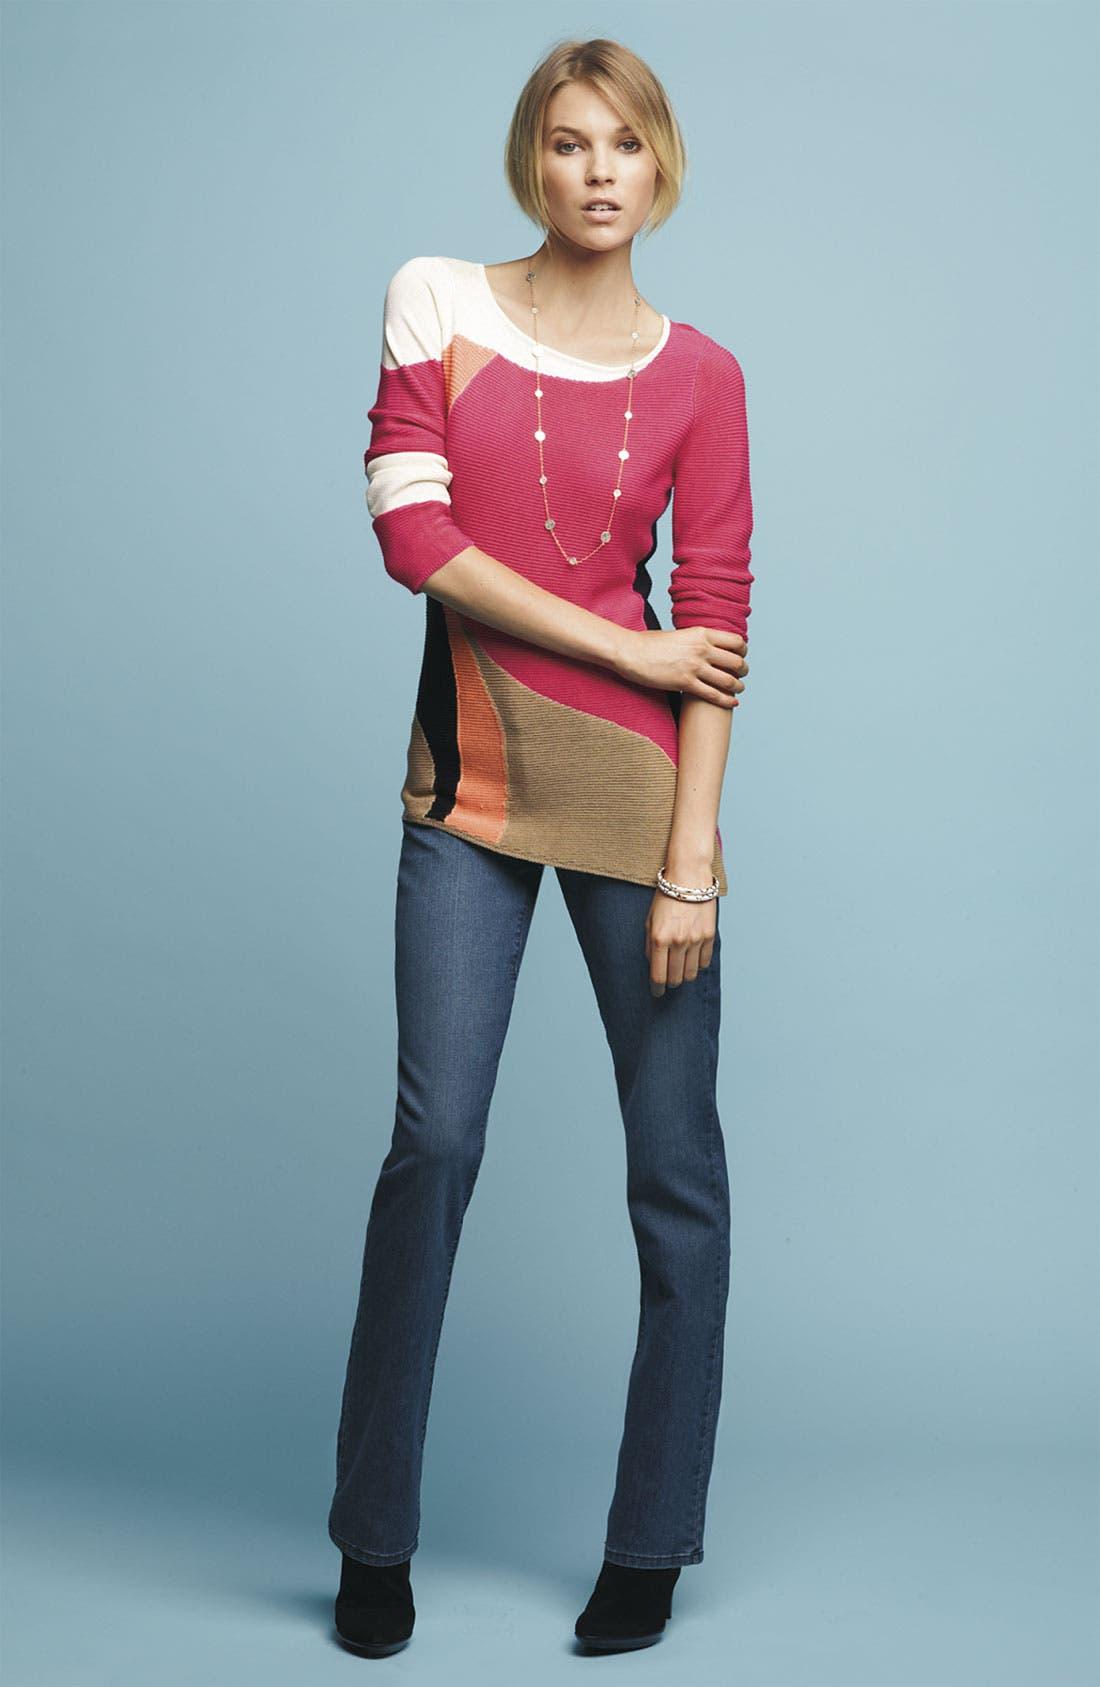 Main Image - Nic + Zoe Sweater & NYDJ Skinny Jeans